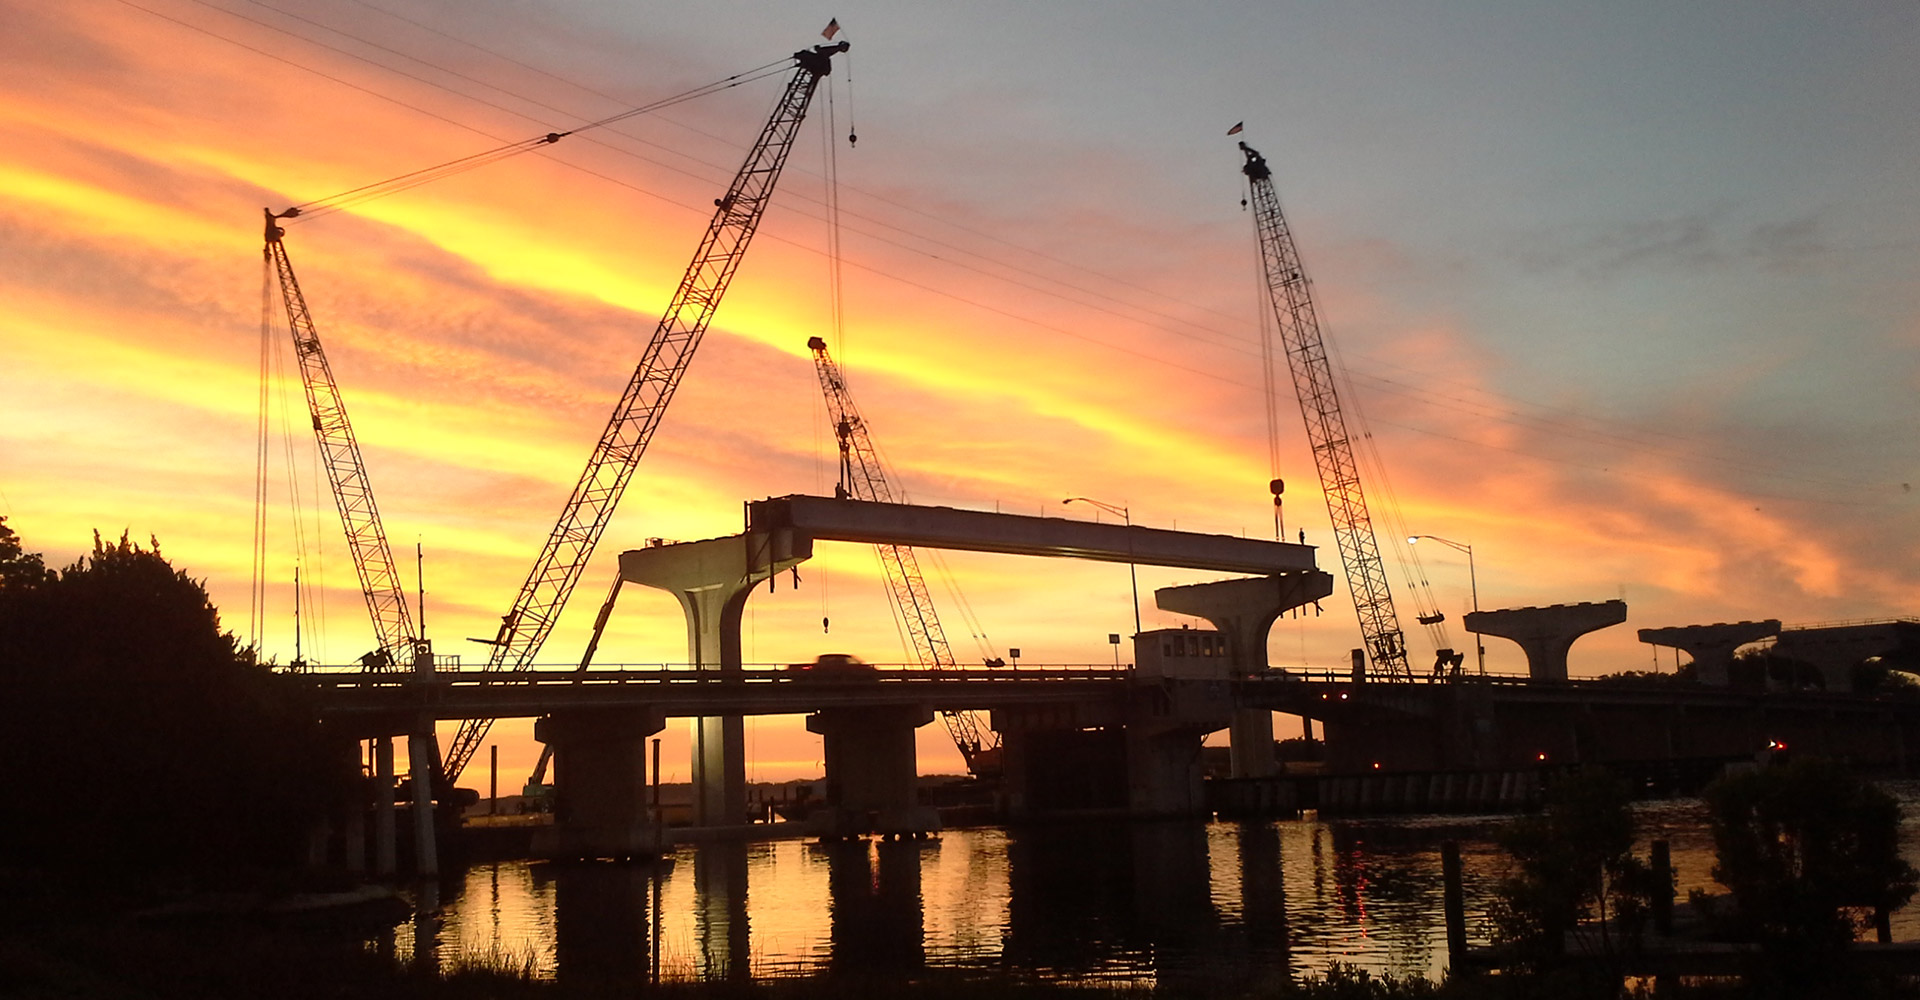 SR 105 Bridge Replacement construction silhouette at sunset.